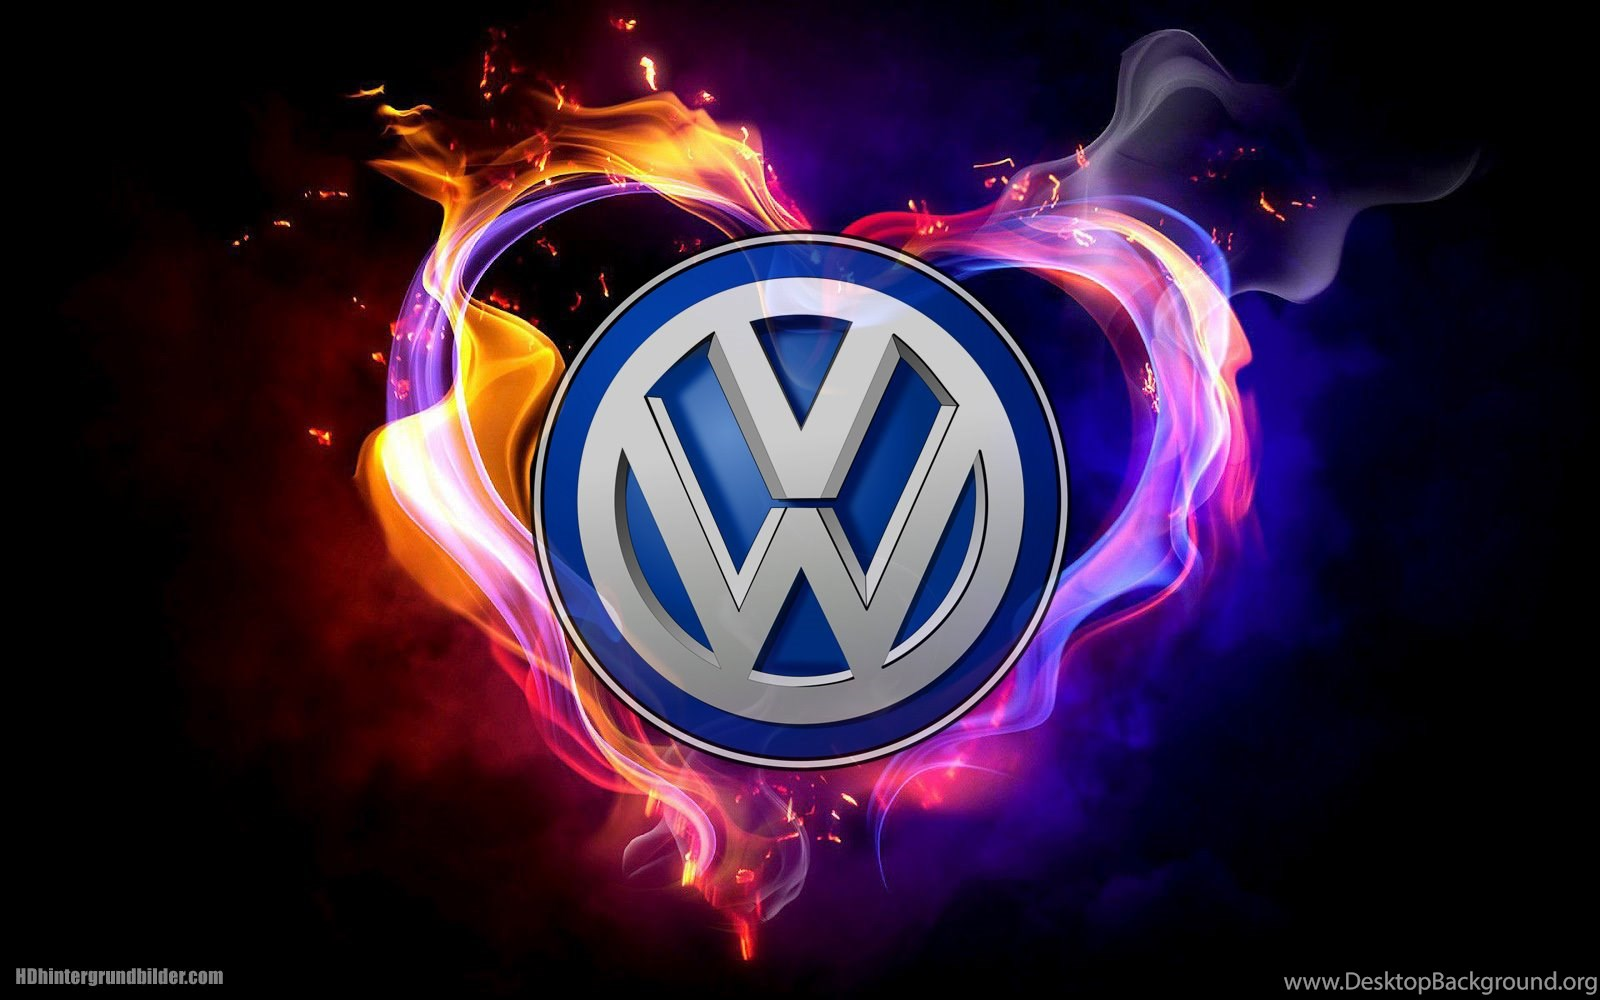 Logo VW Wallpapers Desktop Background